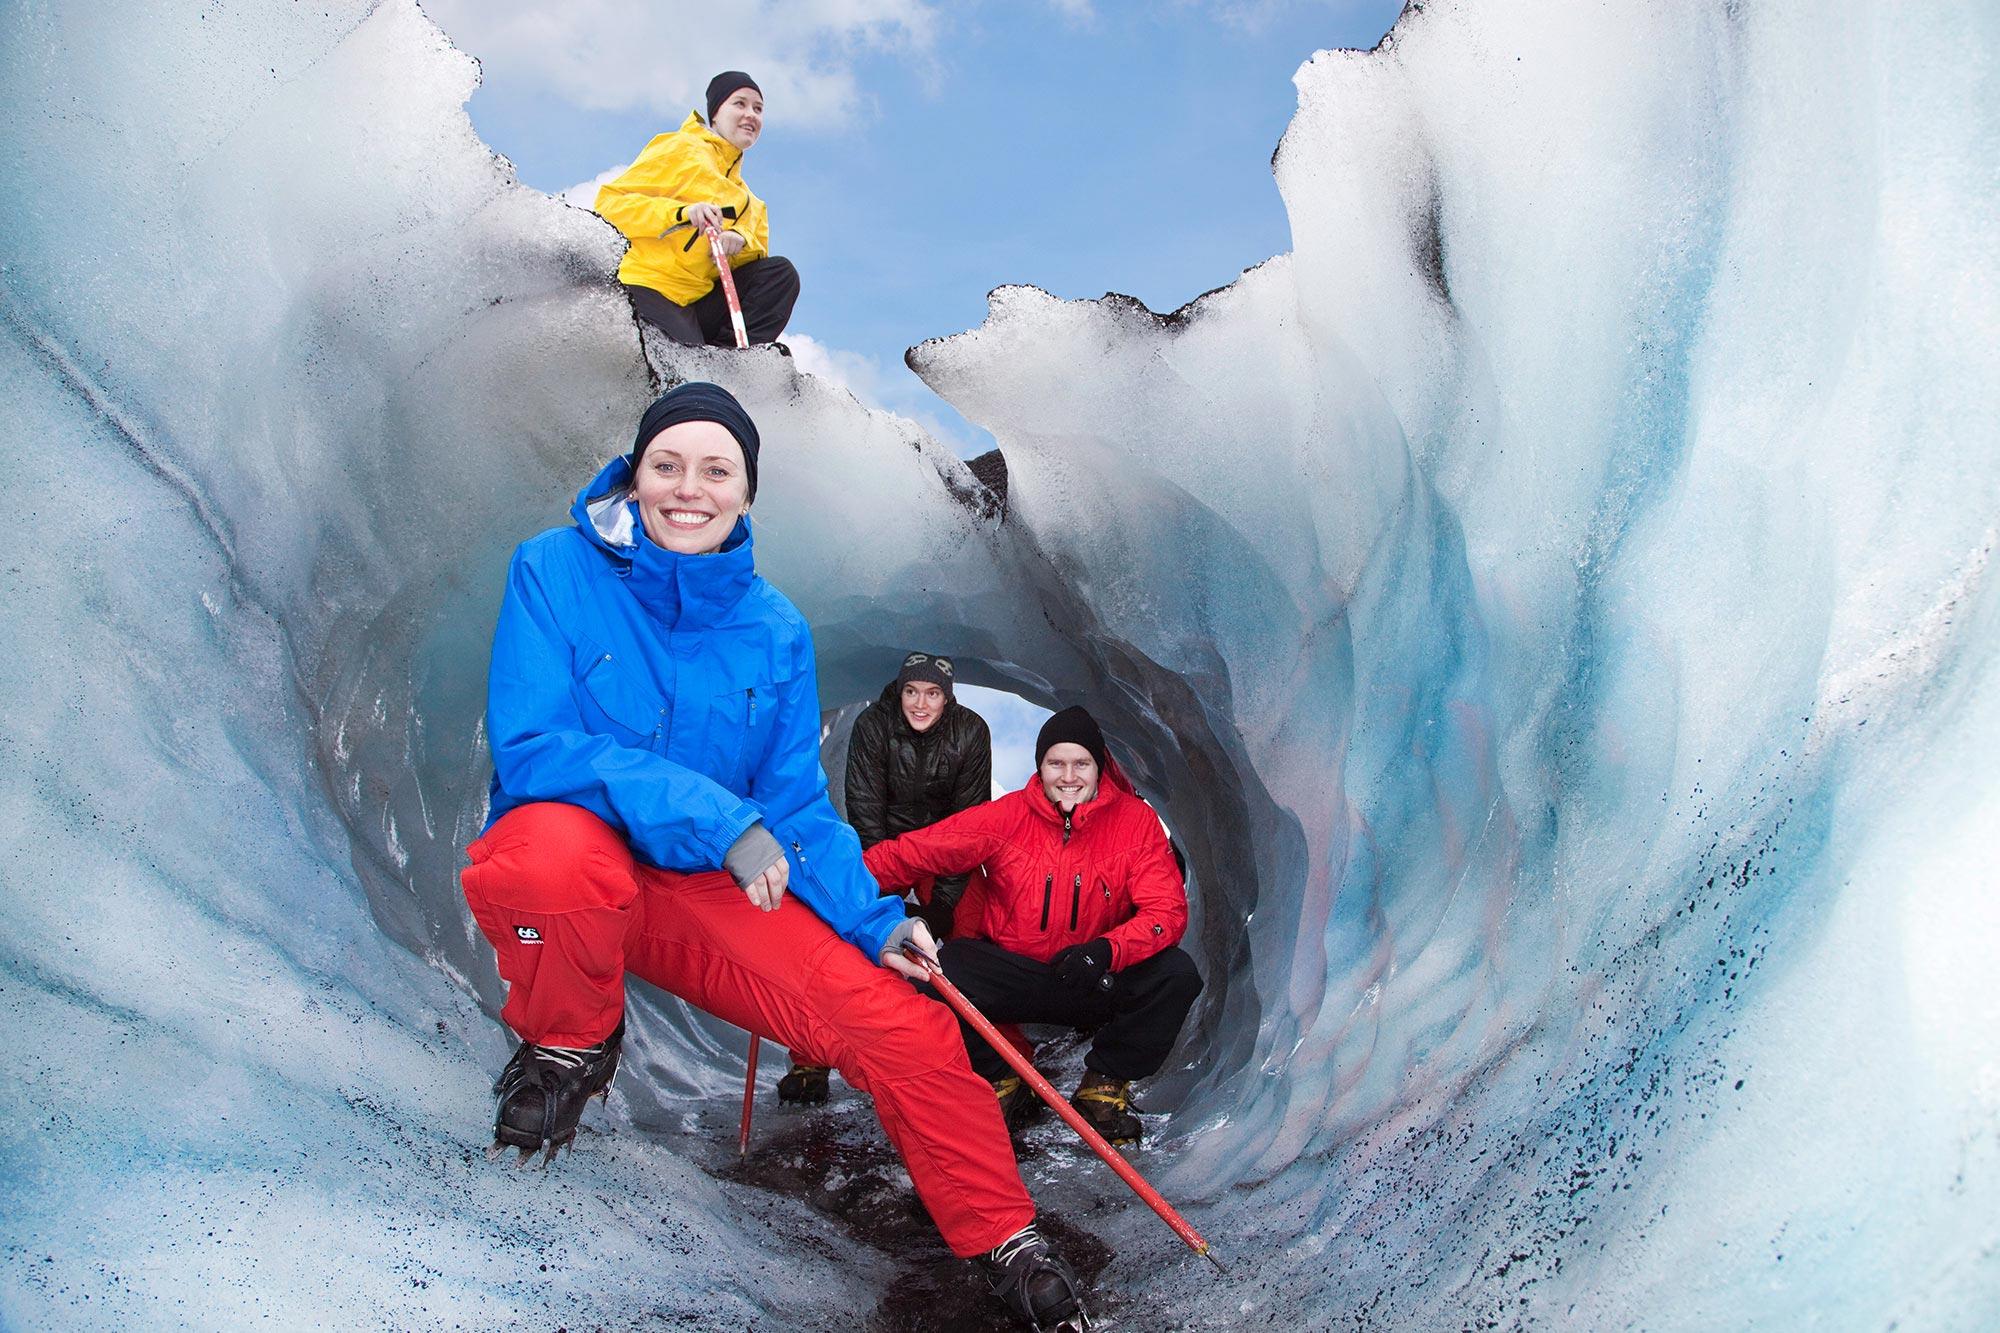 (c) Bjorgvin-Hilmarsson - Solheimajokull ice trekking